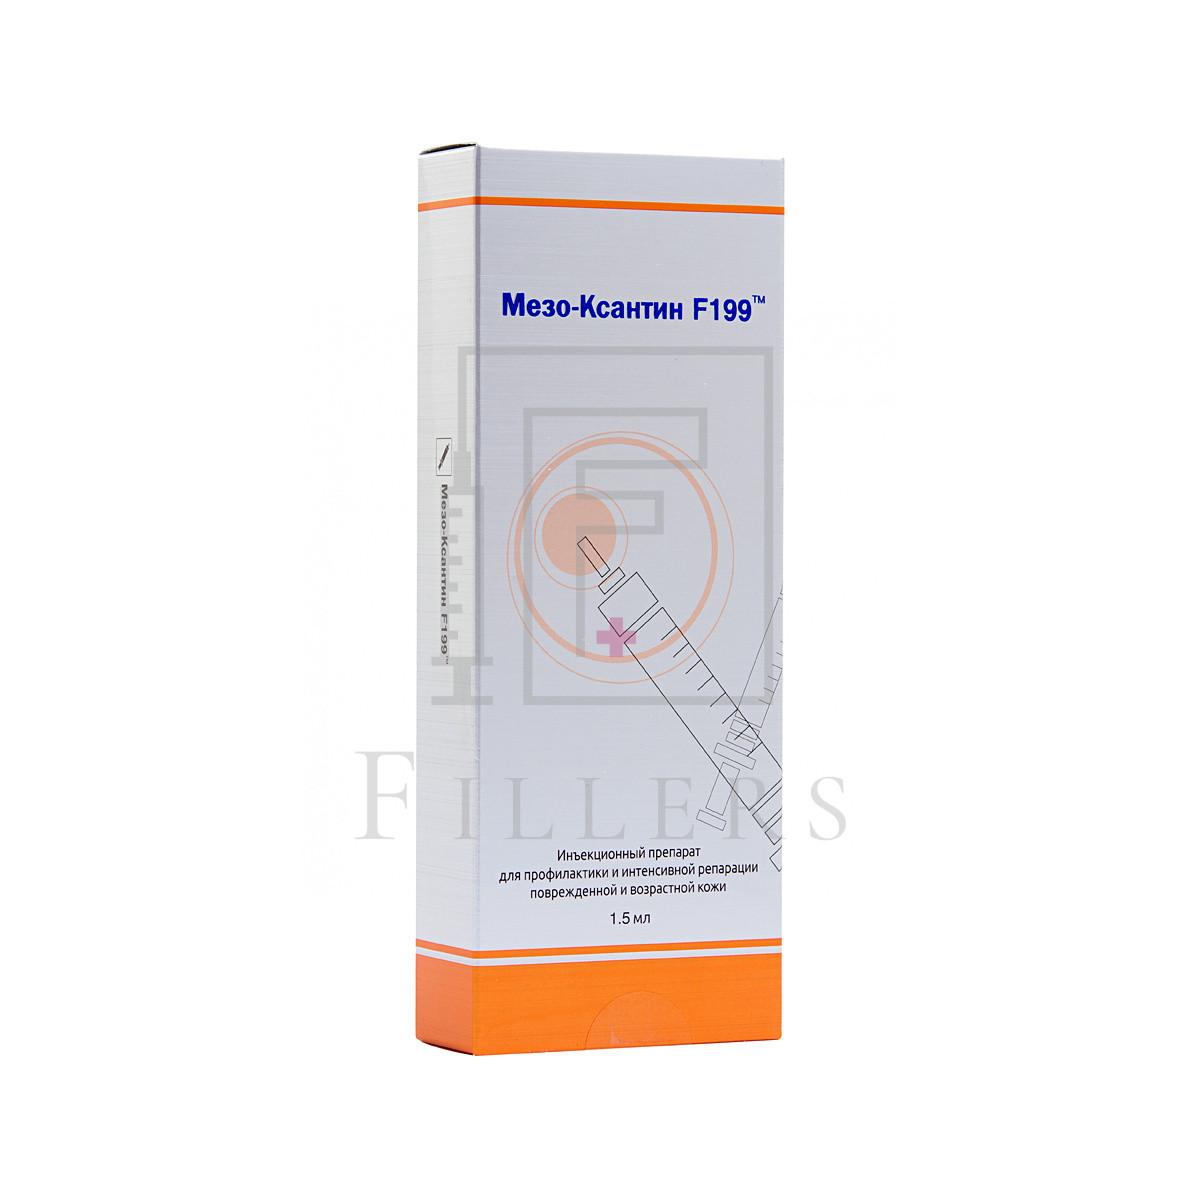 Meso-Xanthin F199 (1*1,5ml)